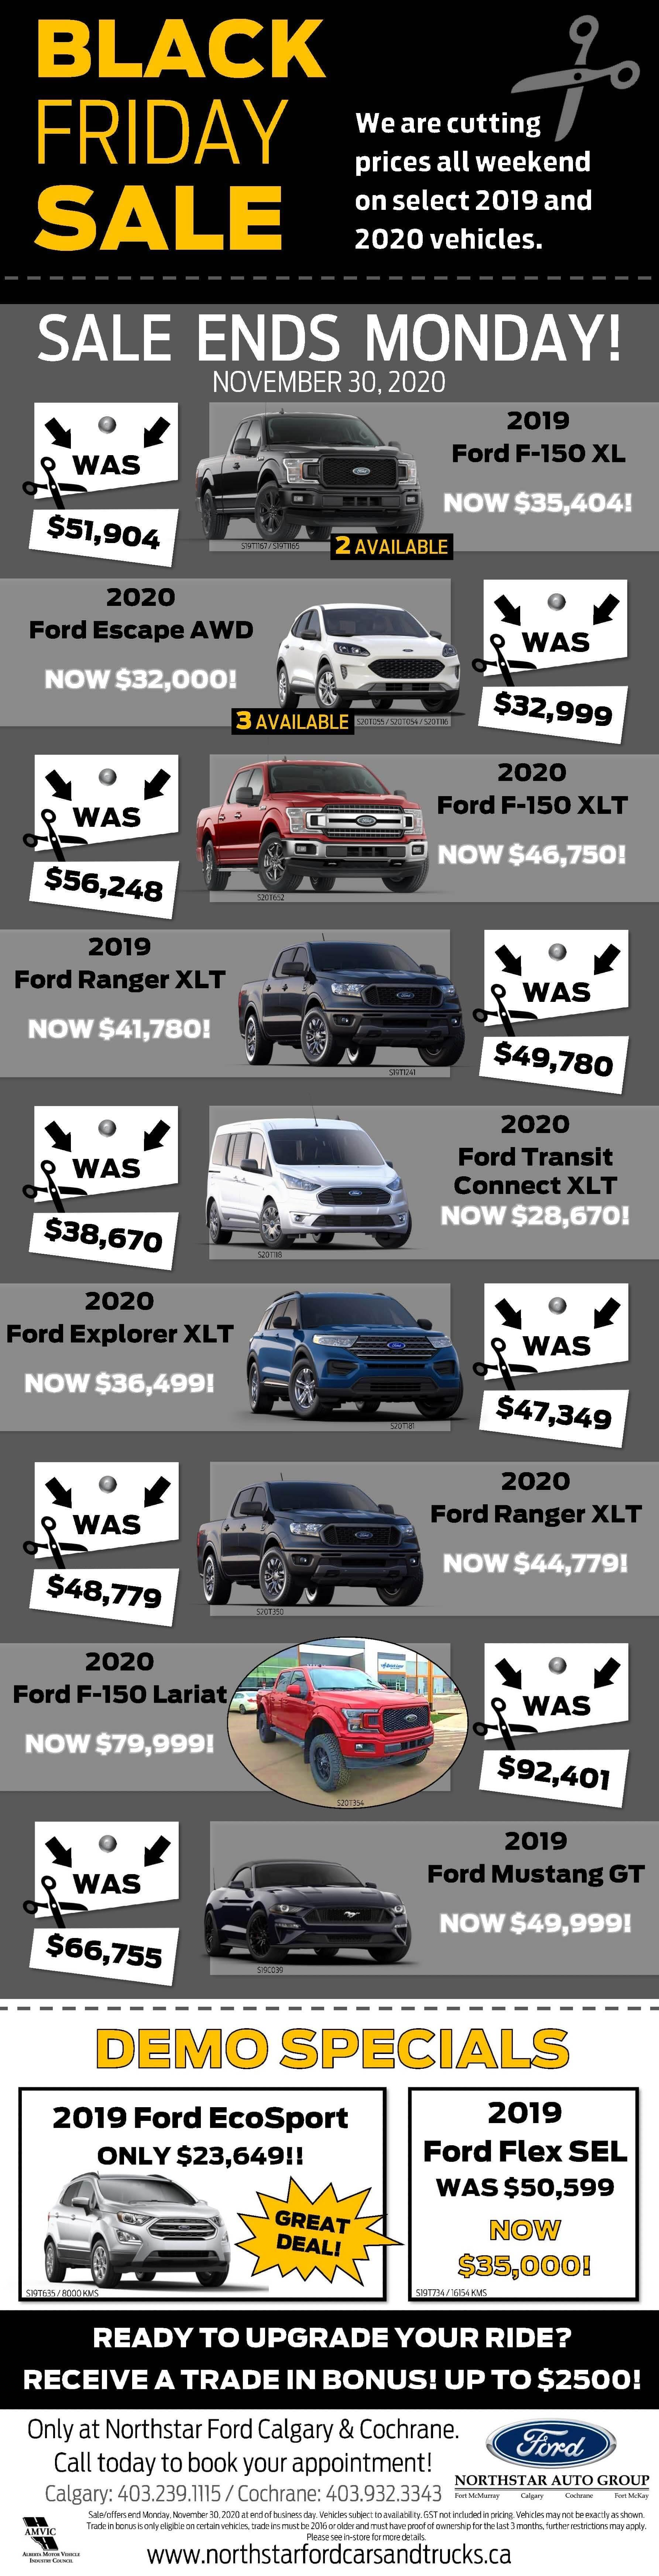 Northstar Ford Calgary Black Friday Sale